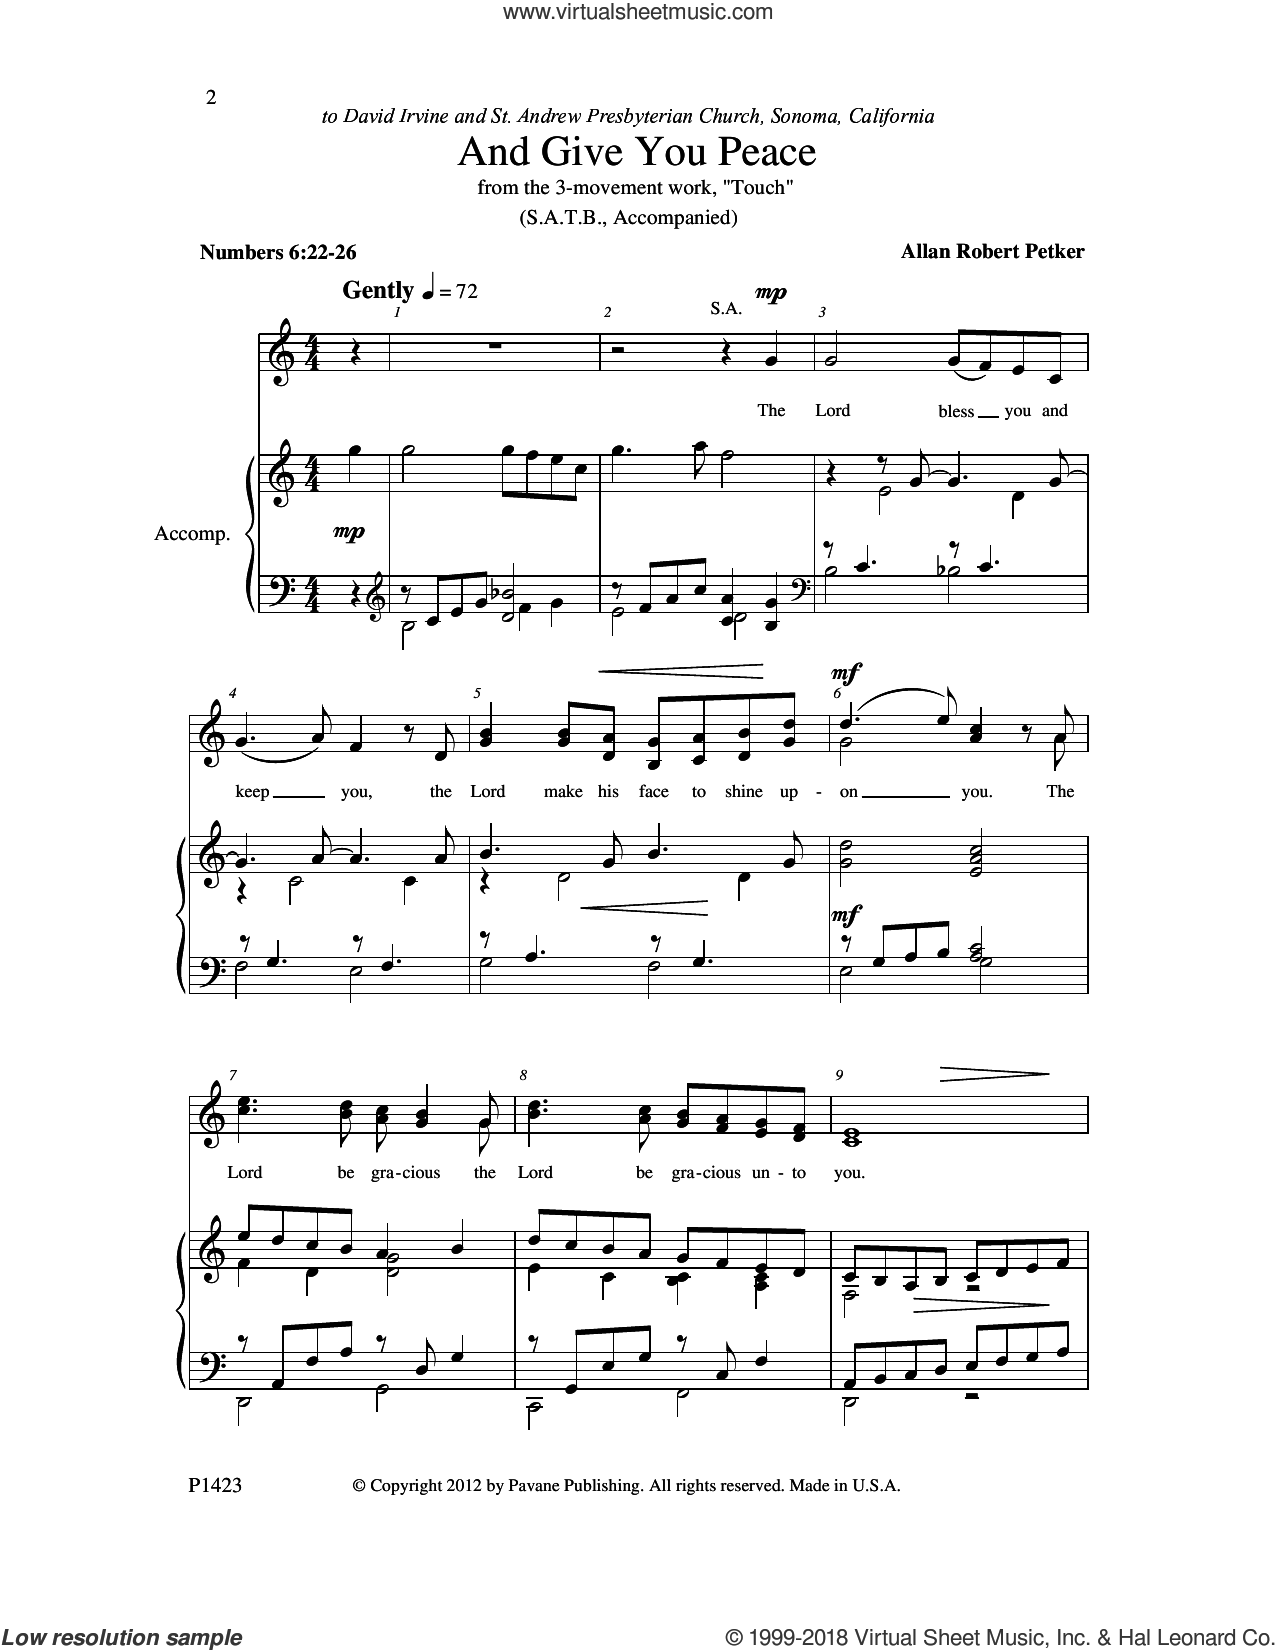 And Give You Peace sheet music for choir (SATB: soprano, alto, tenor, bass) by Allan Robert Petker, intermediate skill level